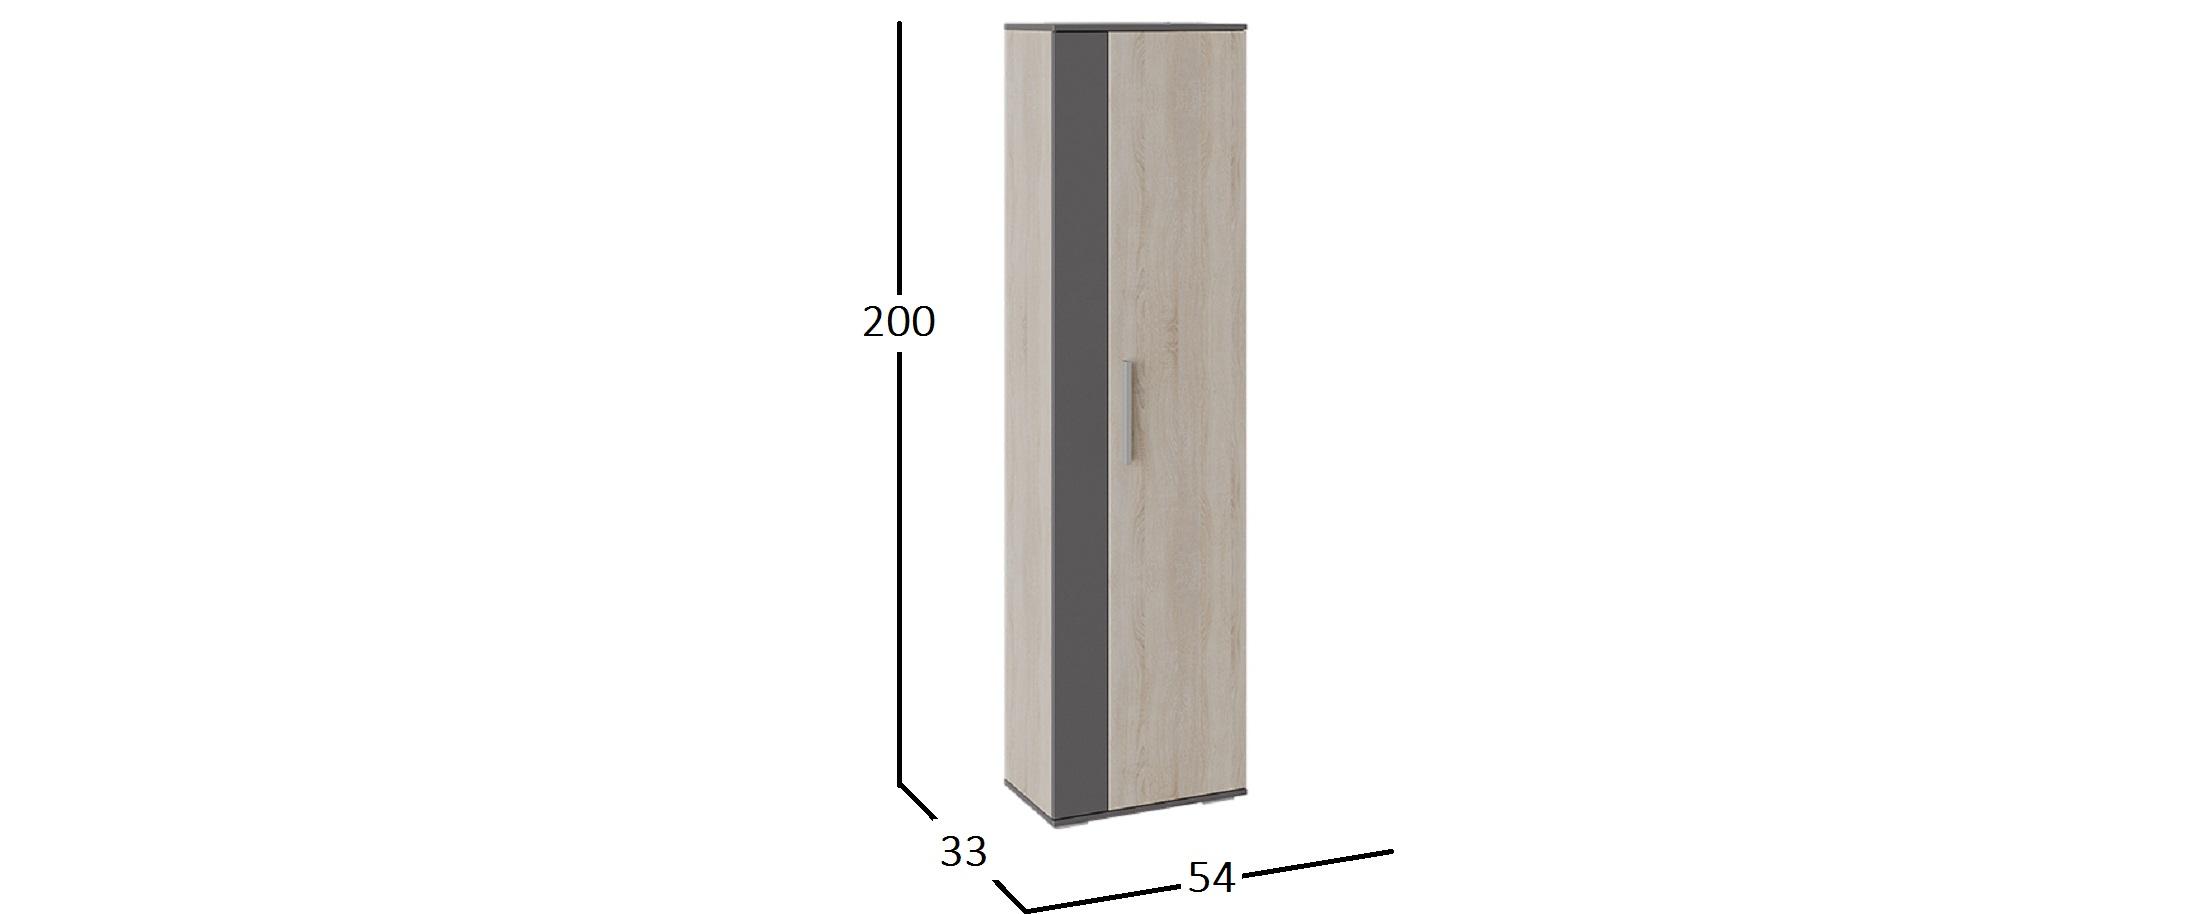 Шкаф Нуар (Фон серый/Дуб сонома) Модель 927